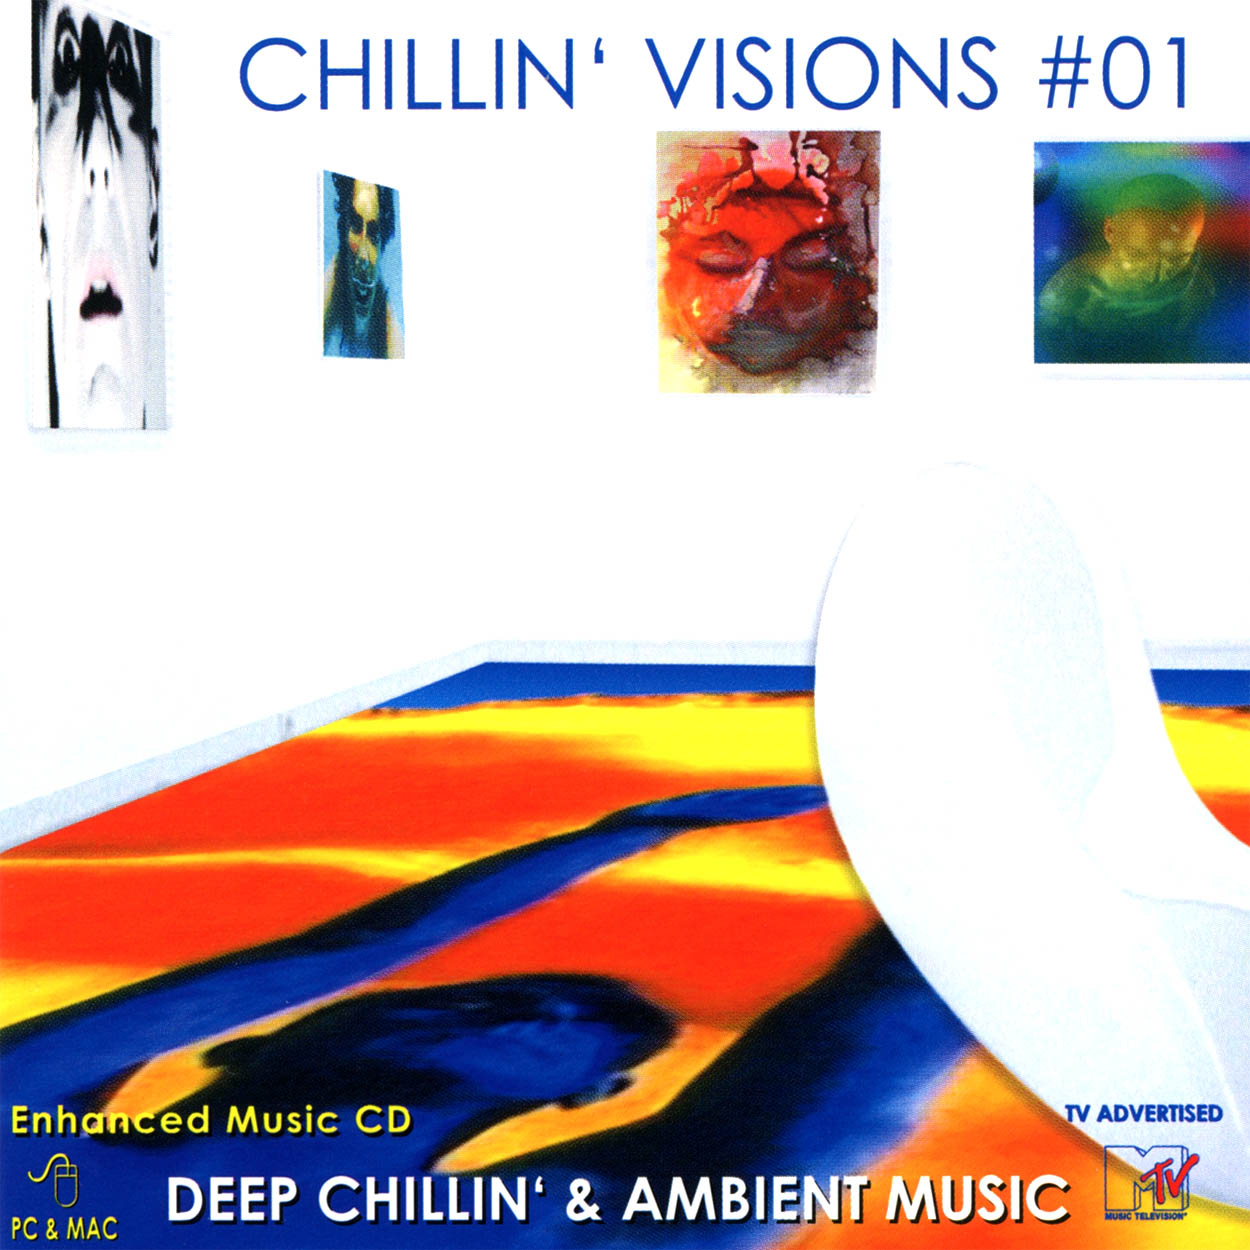 Chillin' Visions